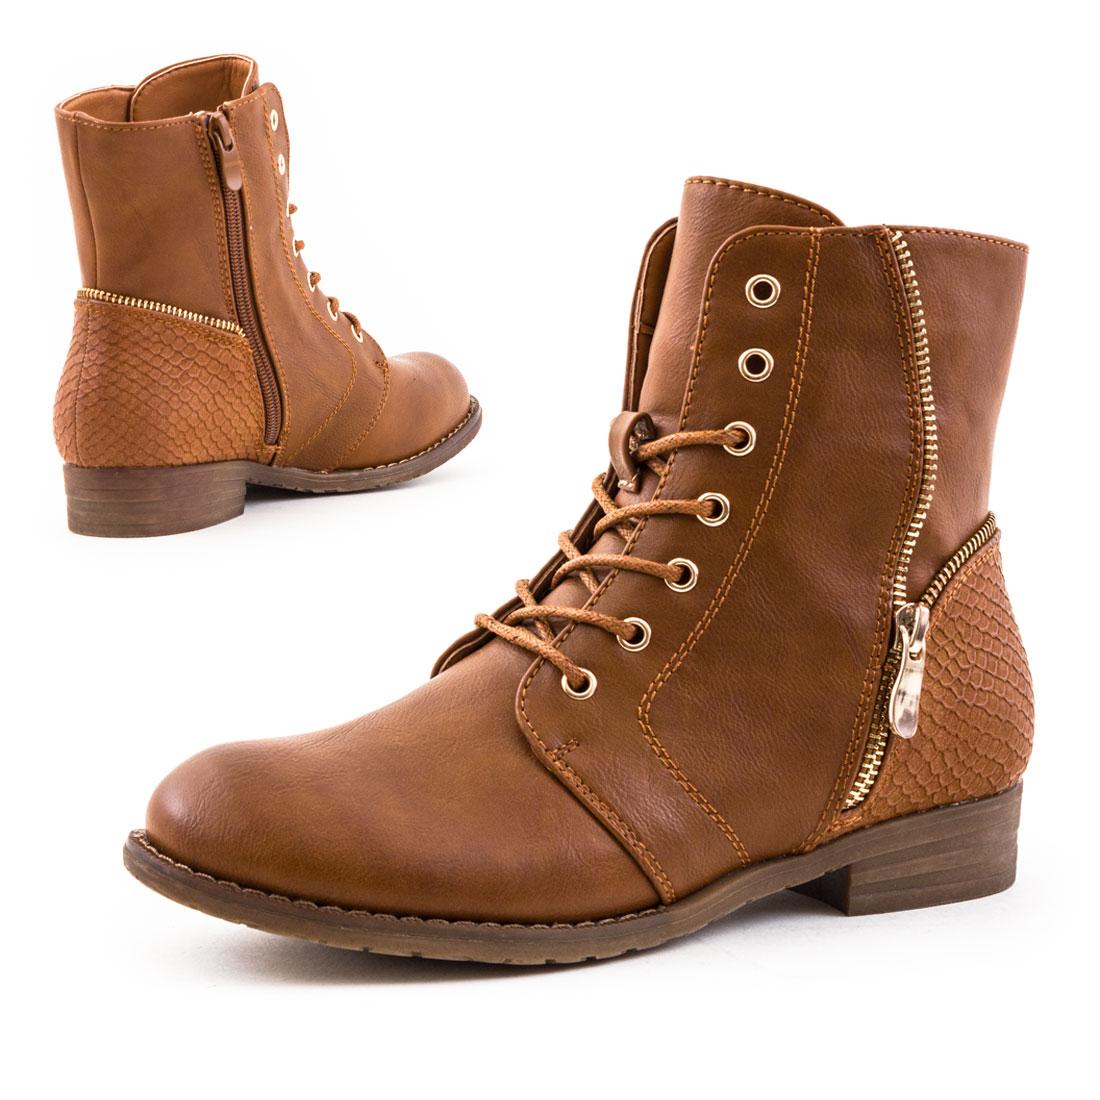 neu damen schn r stiefeletten stiefel boots schuhe gr e 36 37 38 39 40 41. Black Bedroom Furniture Sets. Home Design Ideas